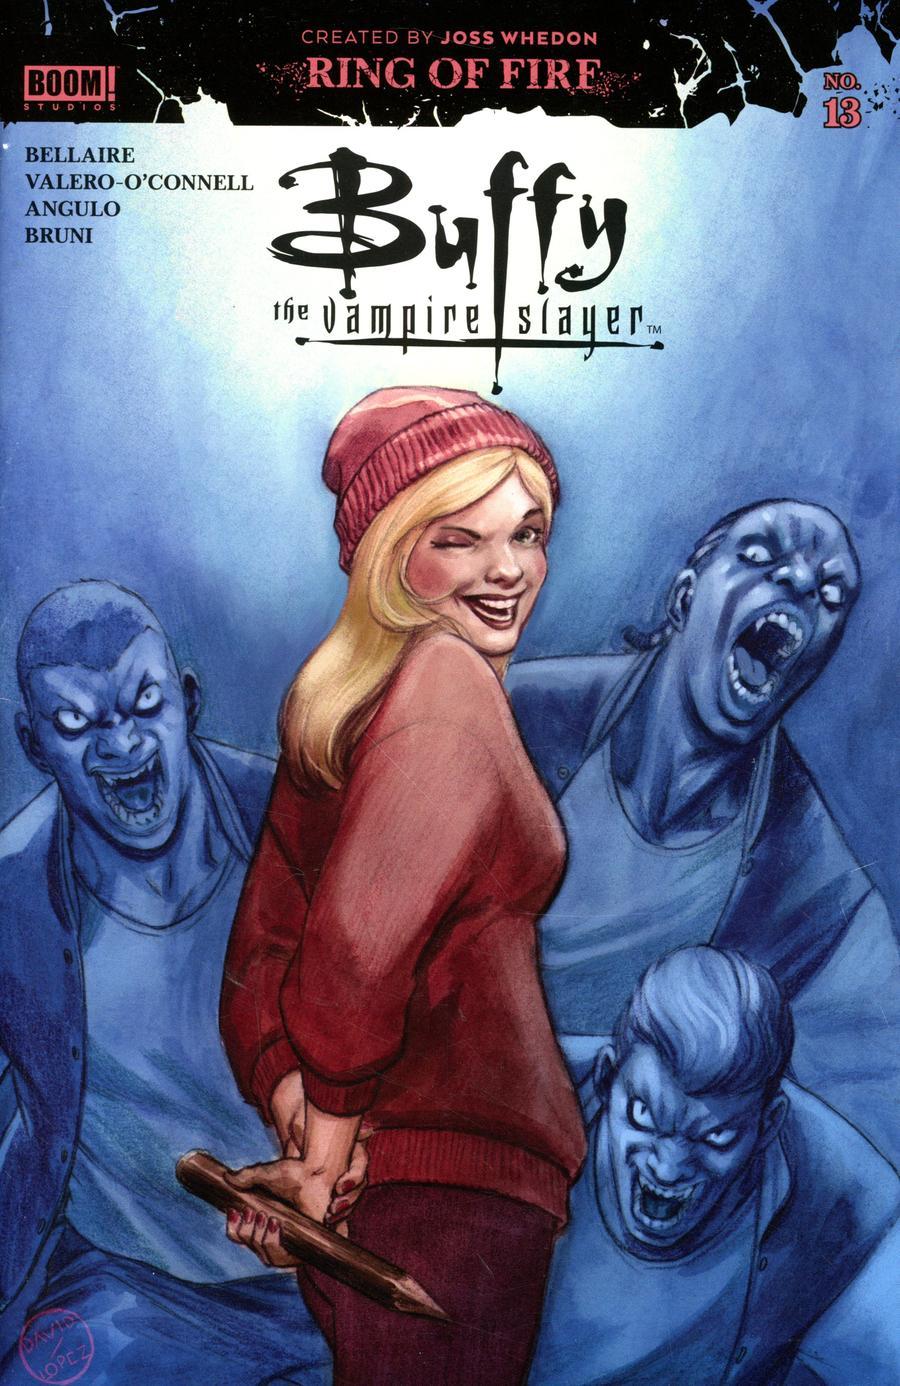 Buffy The Vampire Slayer Vol 2 #13 Cover B Variant David Lopez Cover